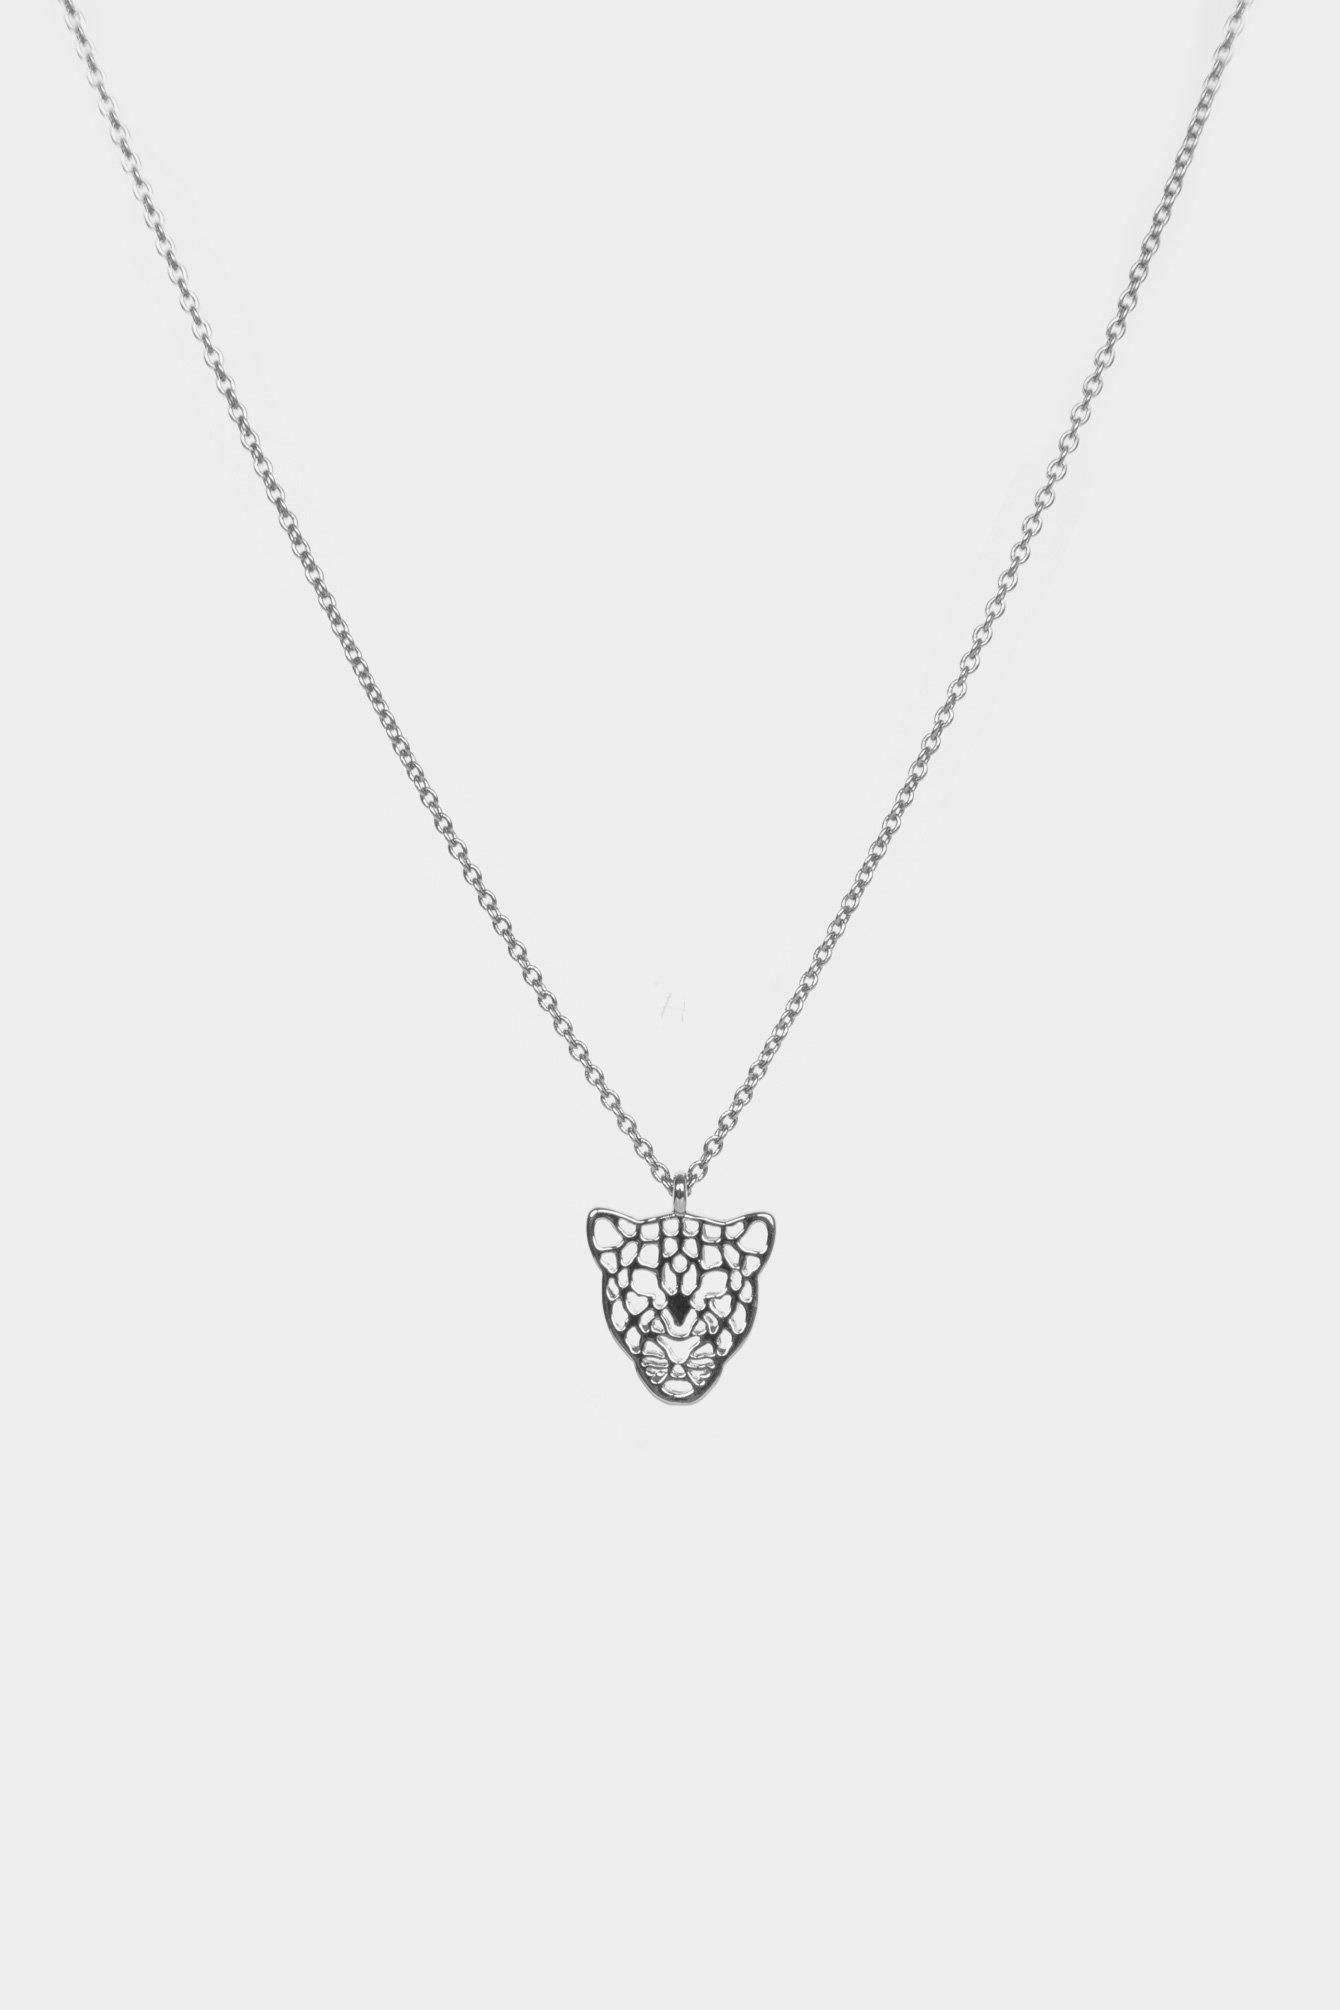 Leopard necklace silver